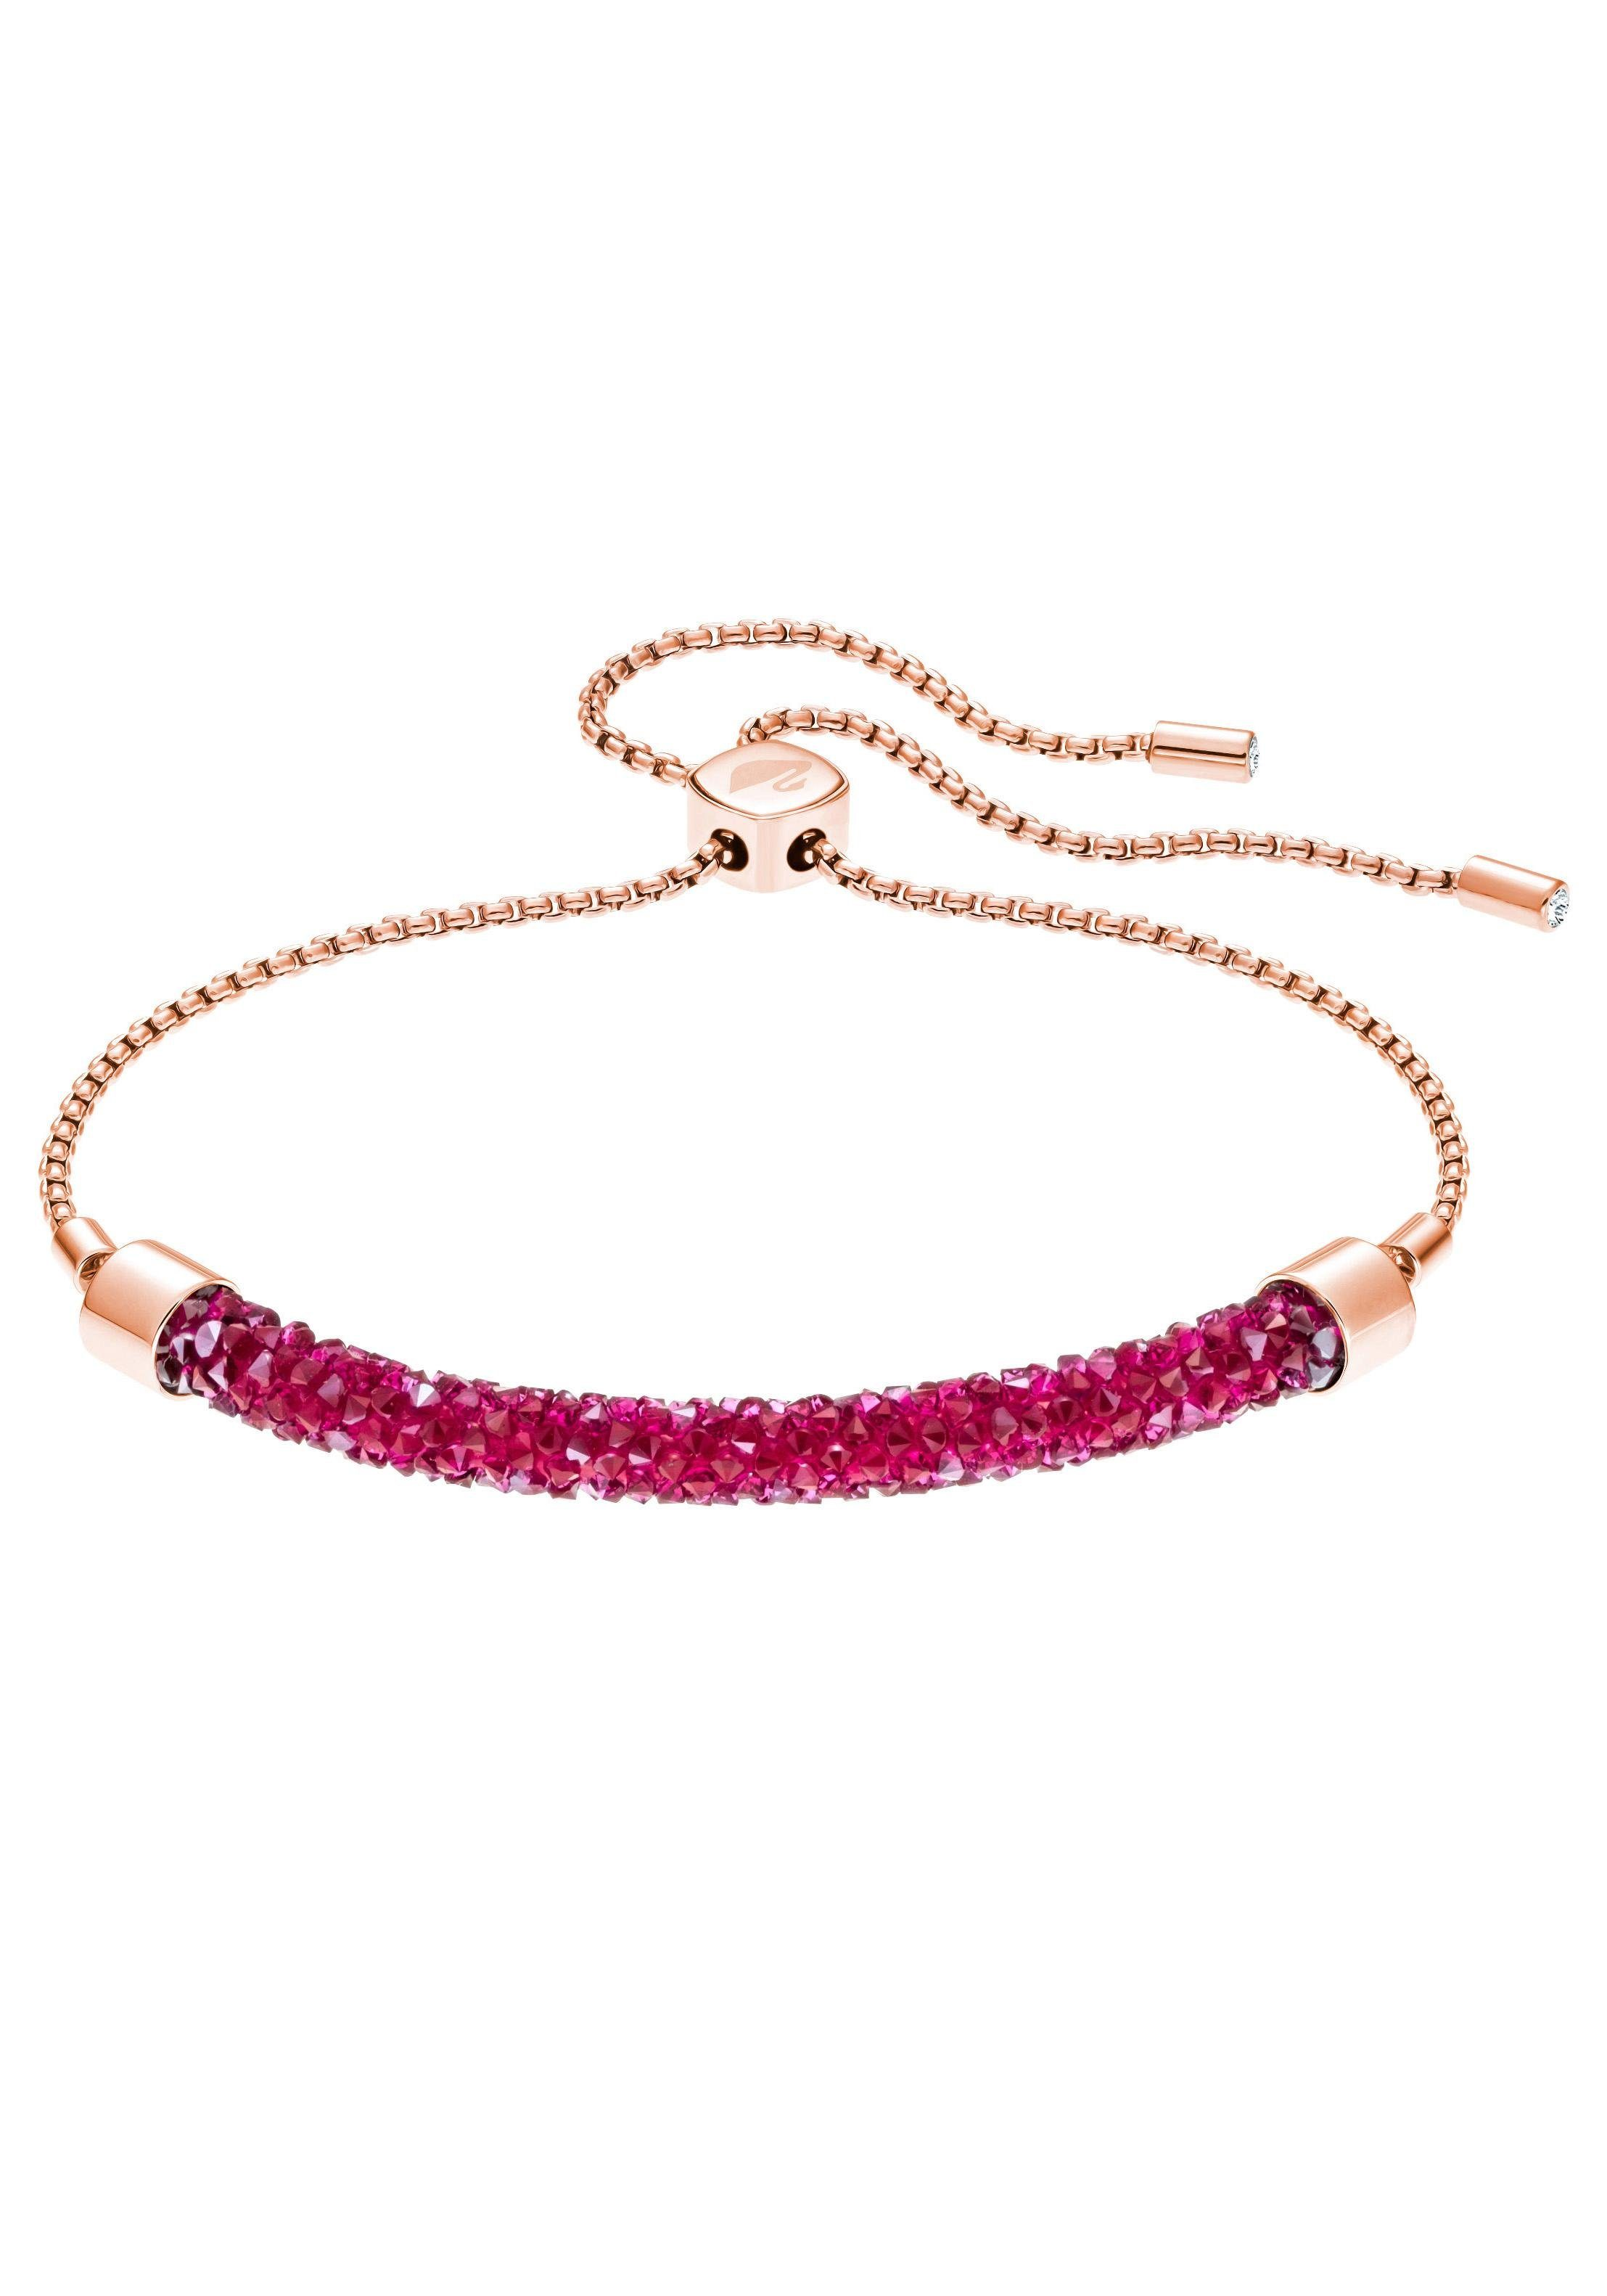 Swarovski Armband »Long Beach Armband, rosa, rosé Vergoldung, 5404434« mit Swarovski® Kristallen